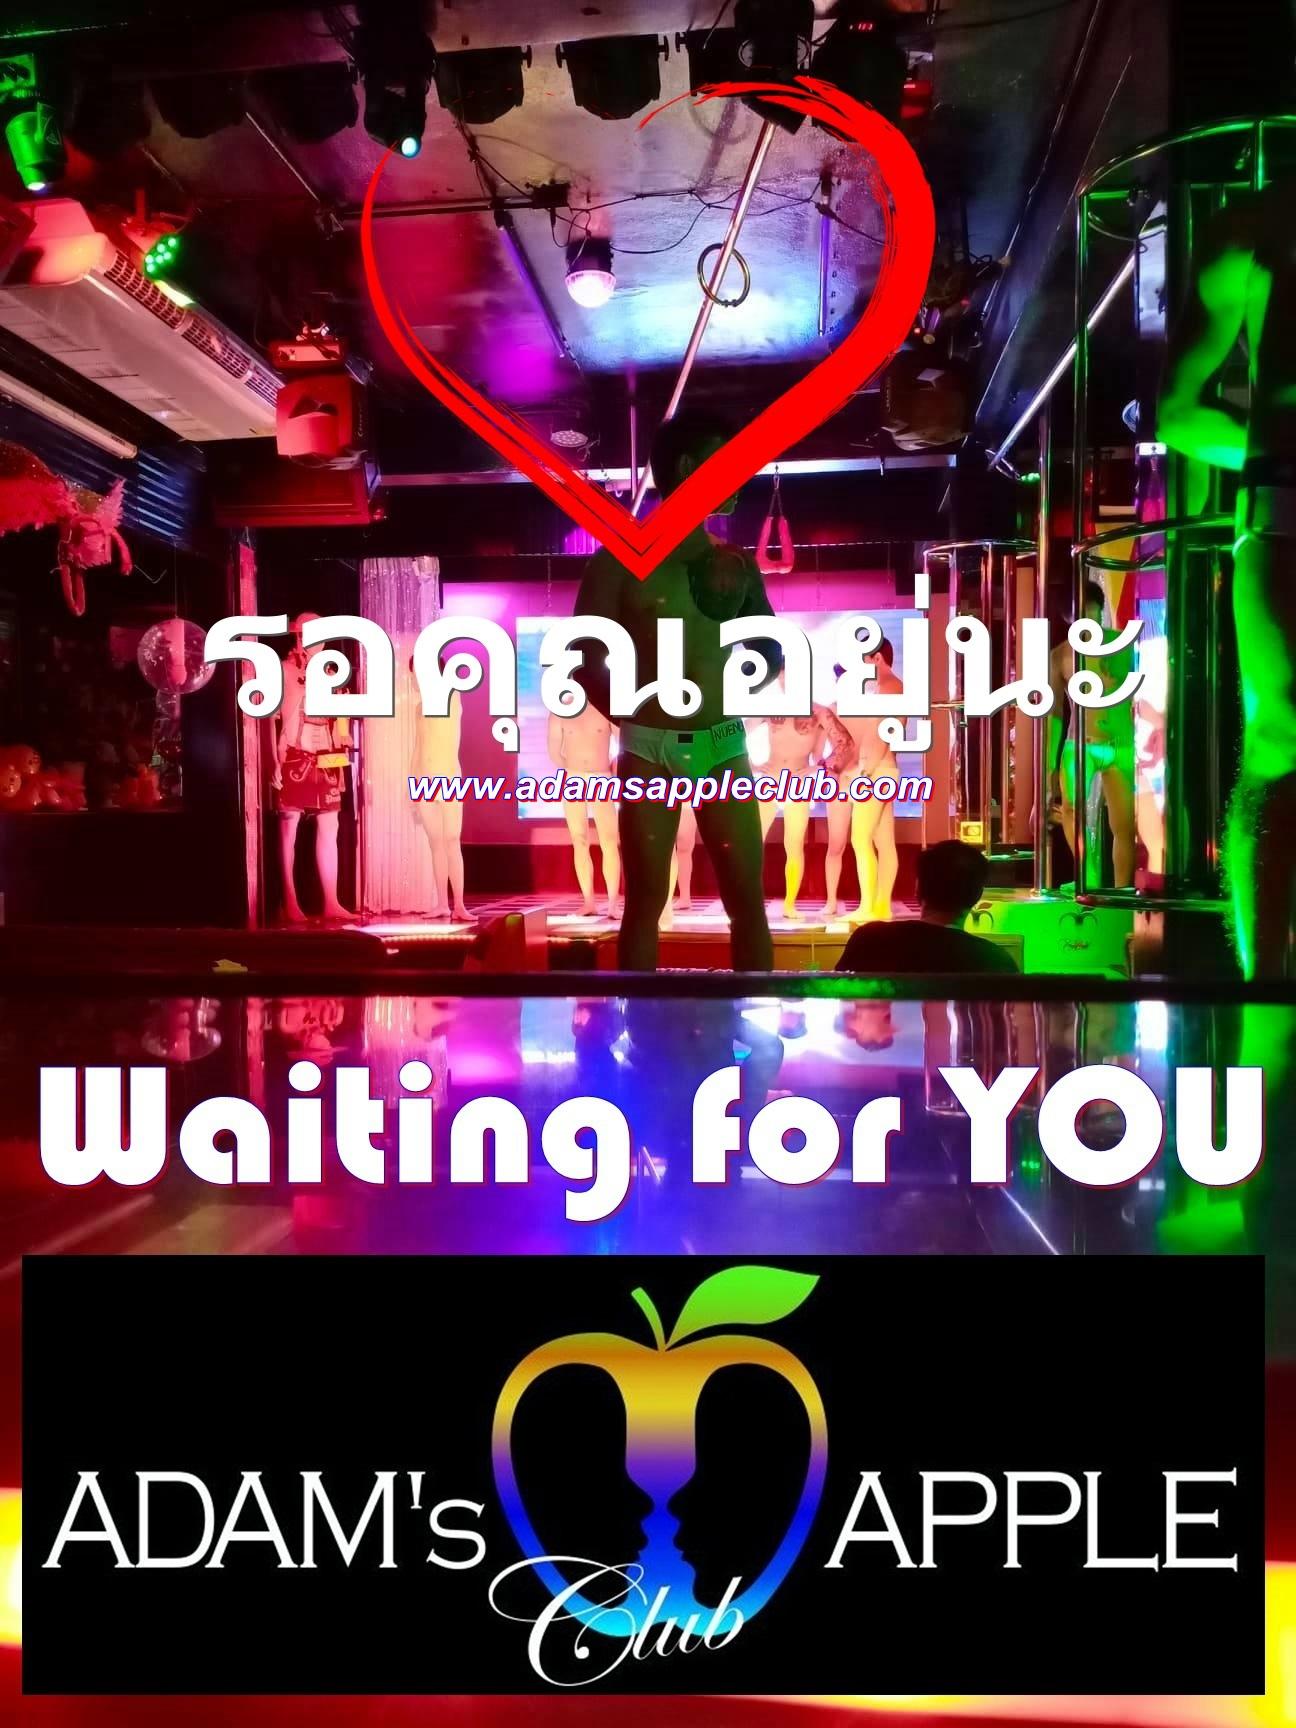 Waiting for YOU รอคุณอยู่นะ Boys Adams Apple Club